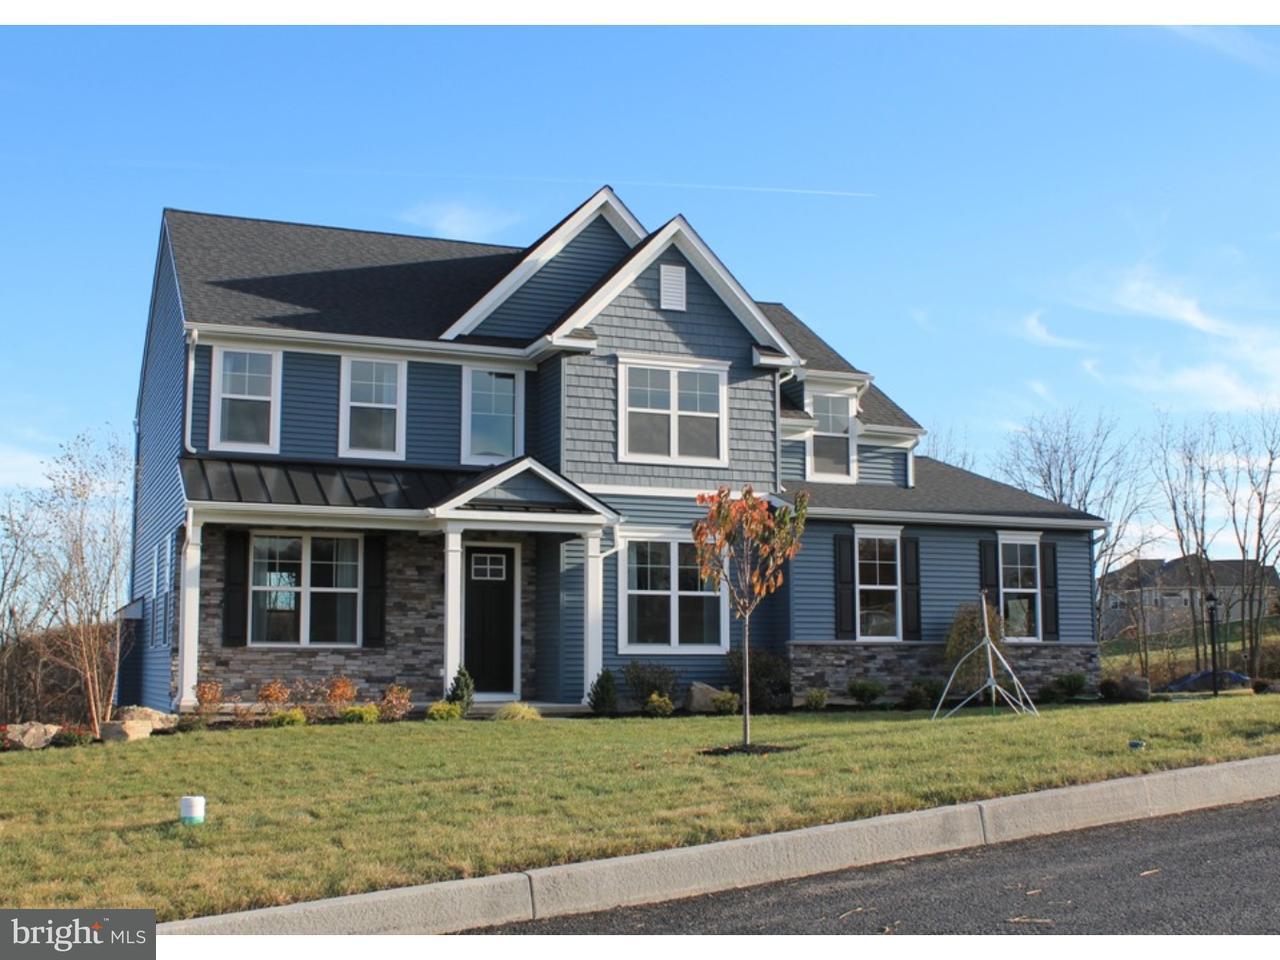 Single Family Home for Sale at 330 KEIM Road Boyertown, Pennsylvania 19512 United States